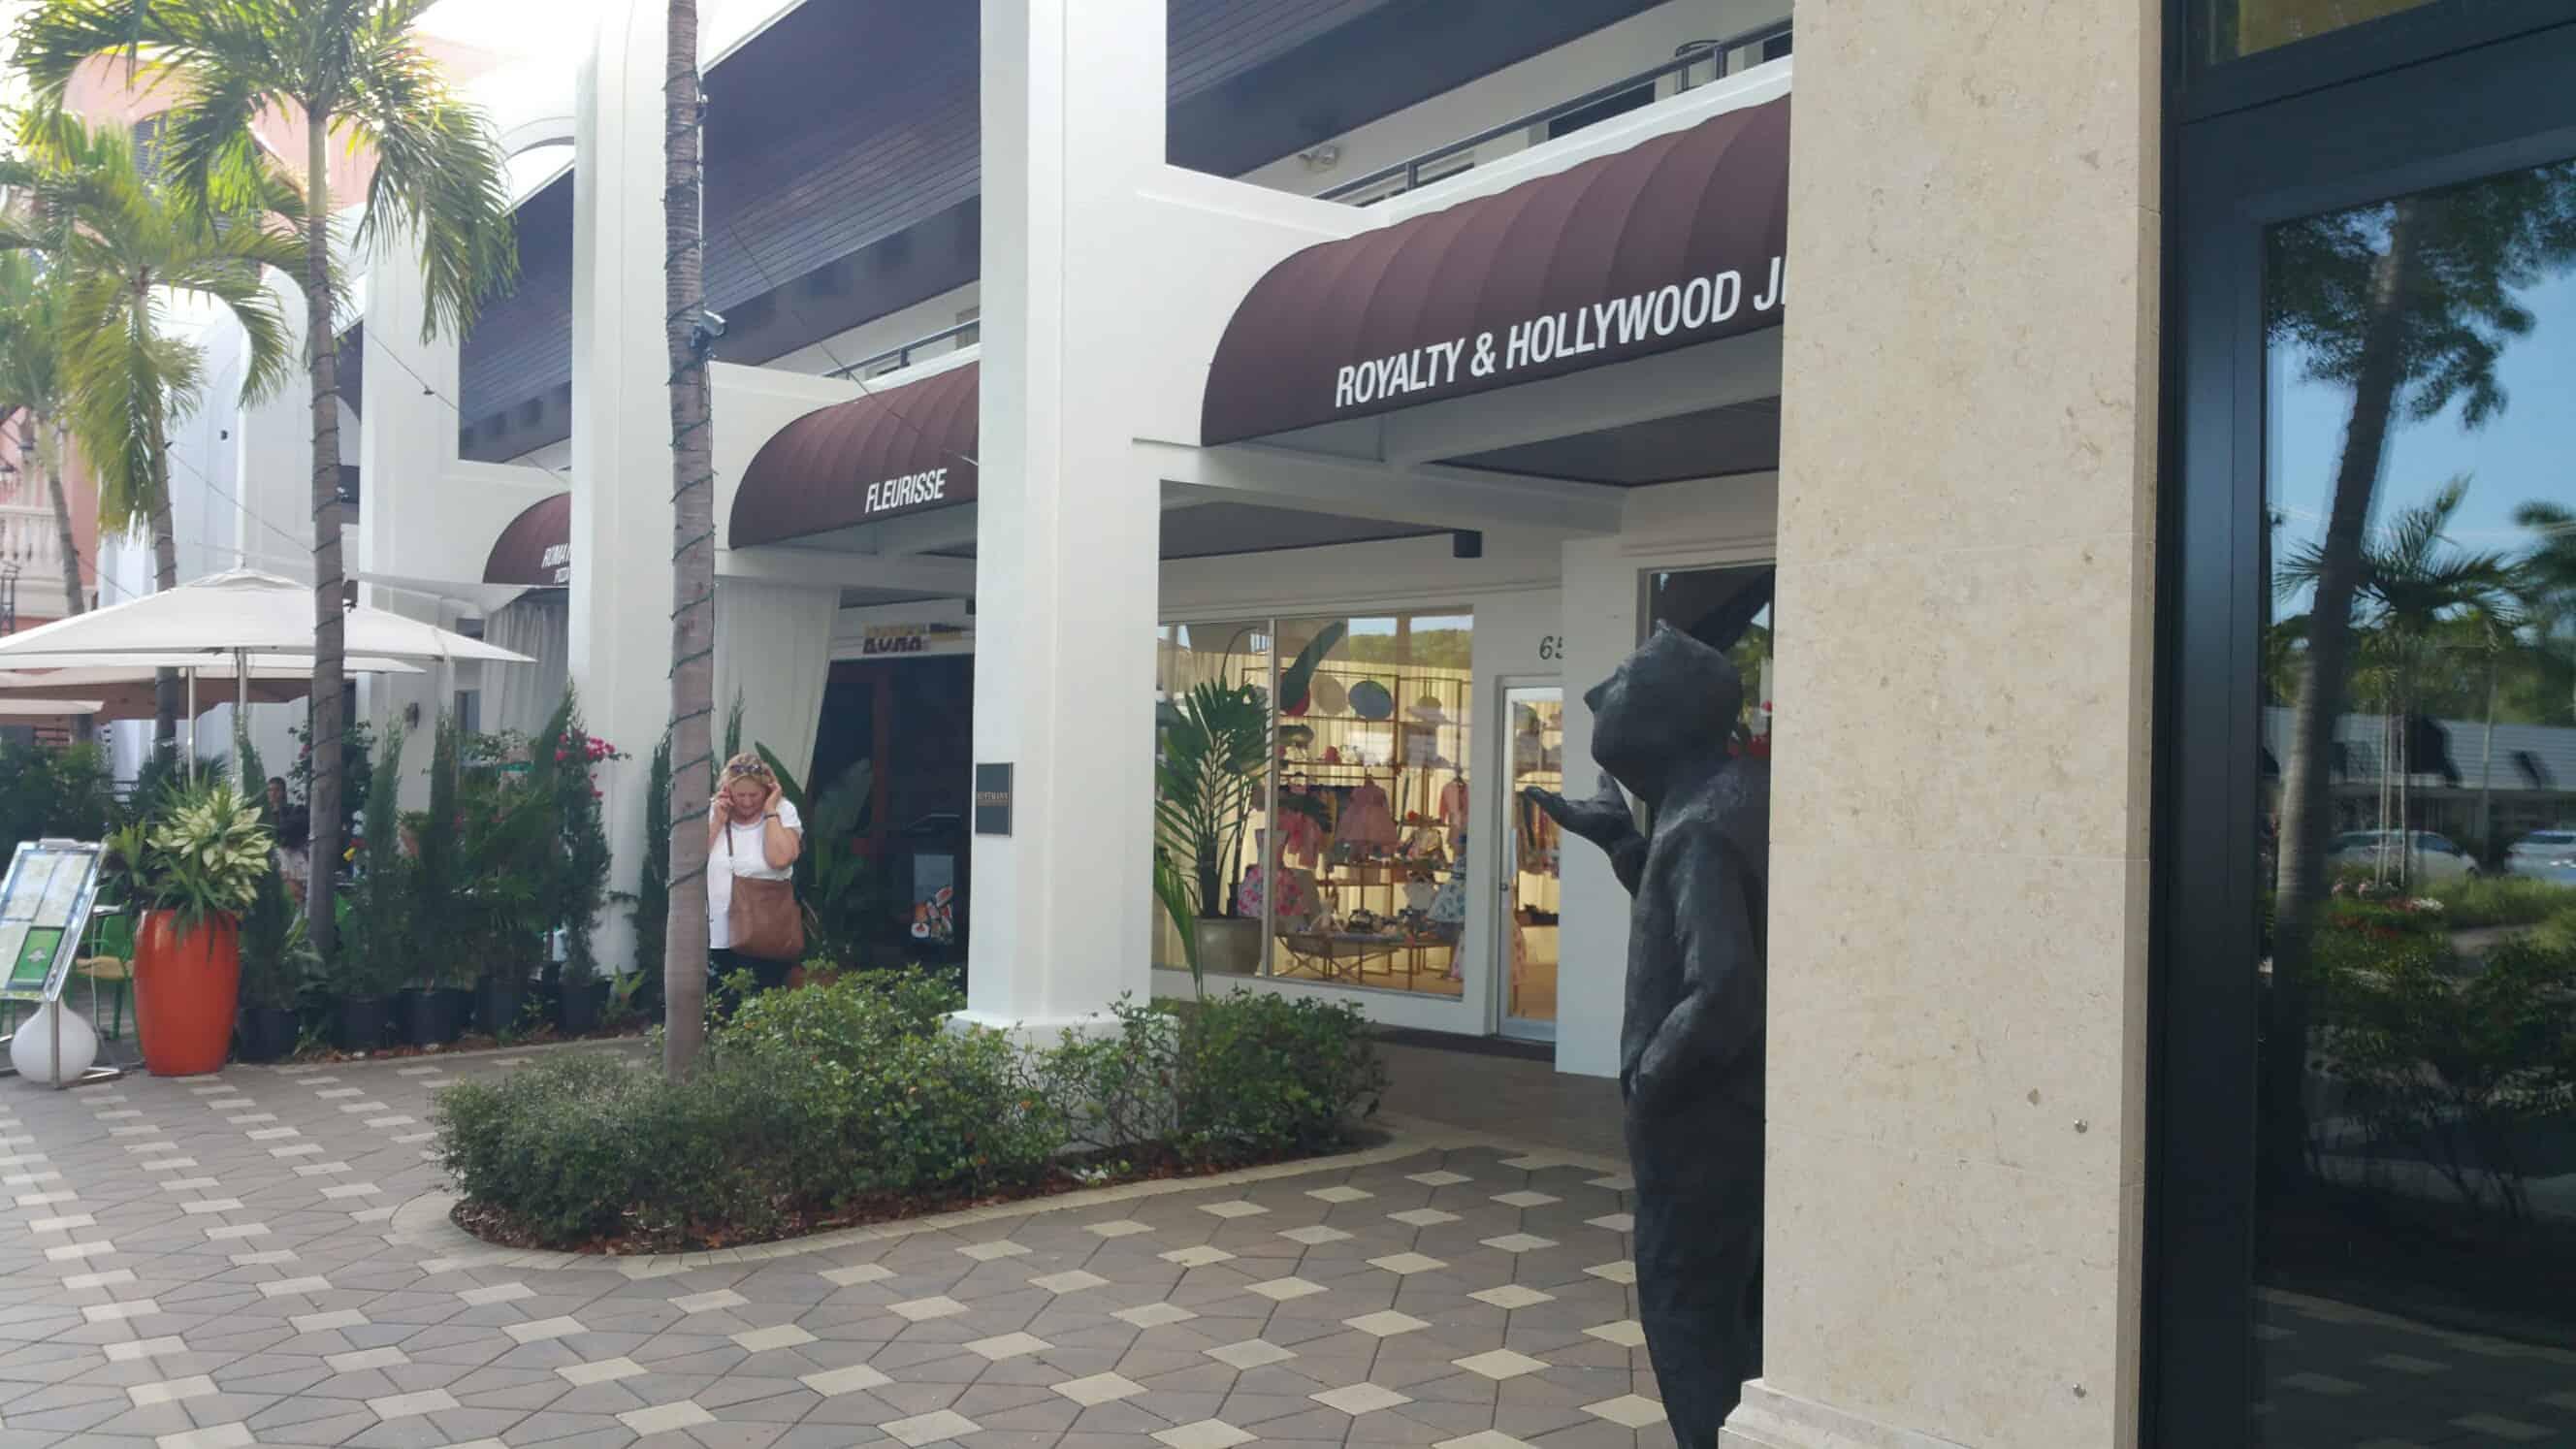 663 5th Avenue South – Prime Retail